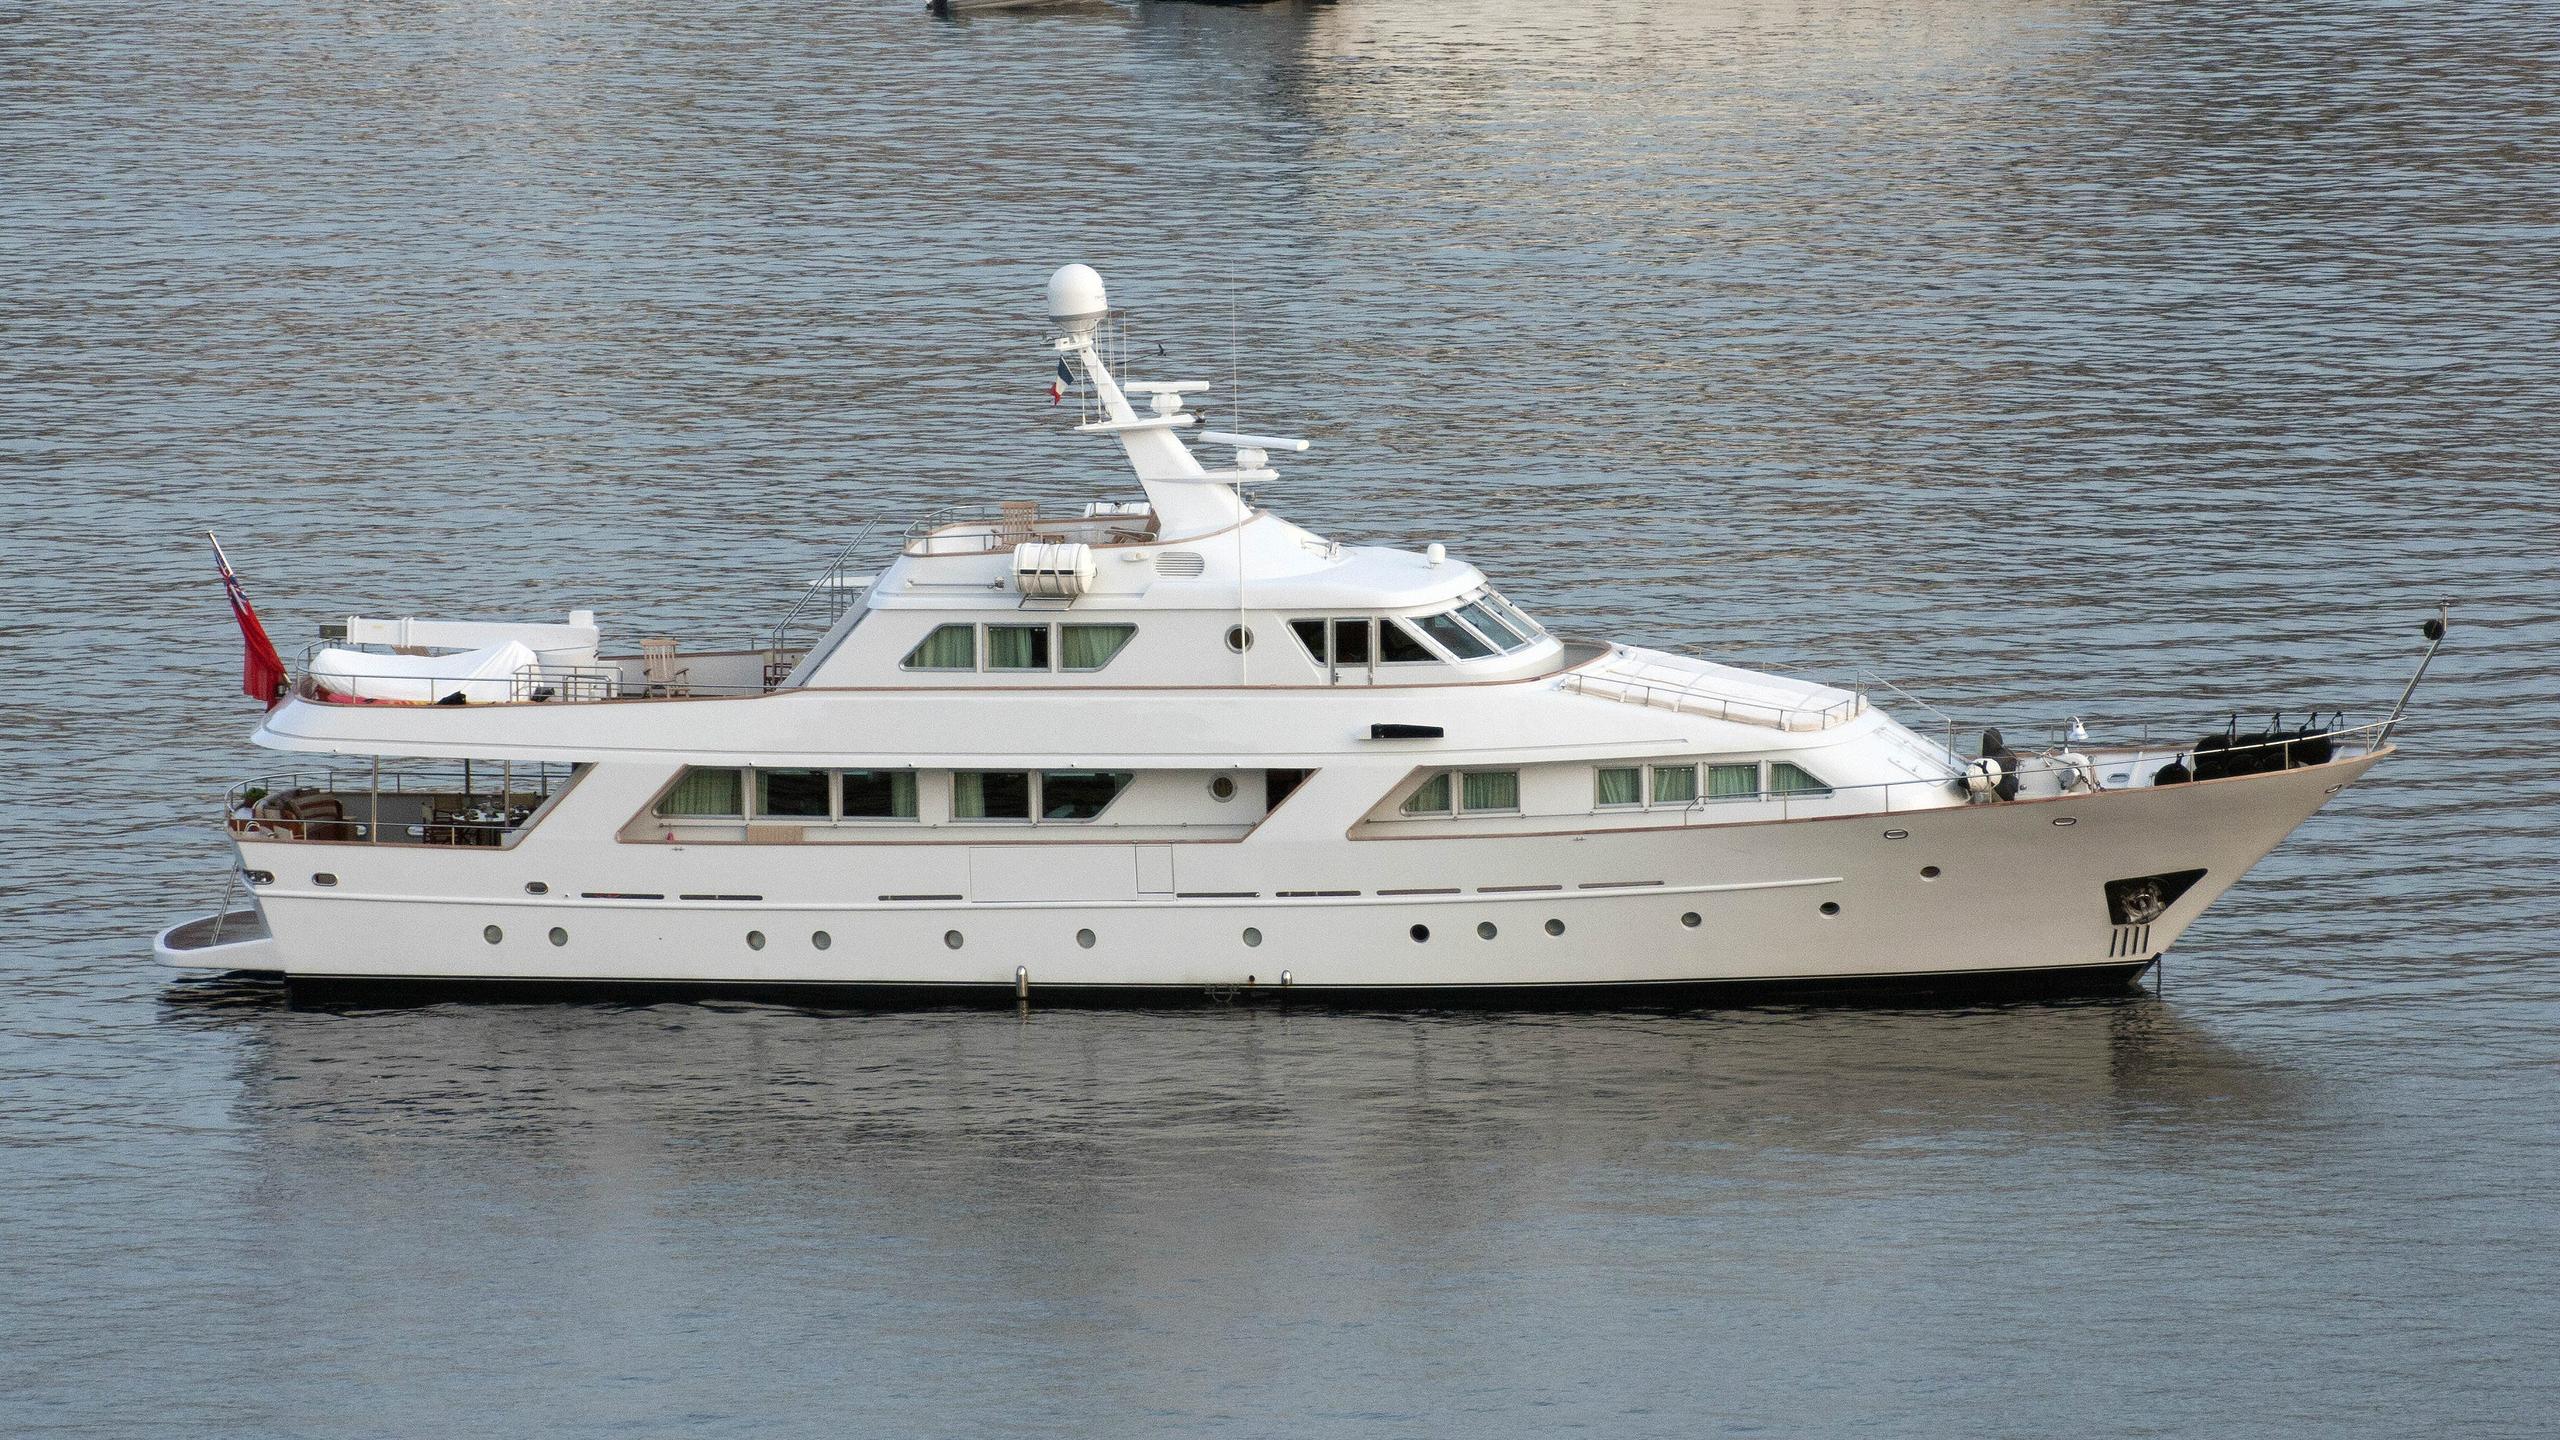 freemont-motor-yacht-benetti-1983-34m-profile